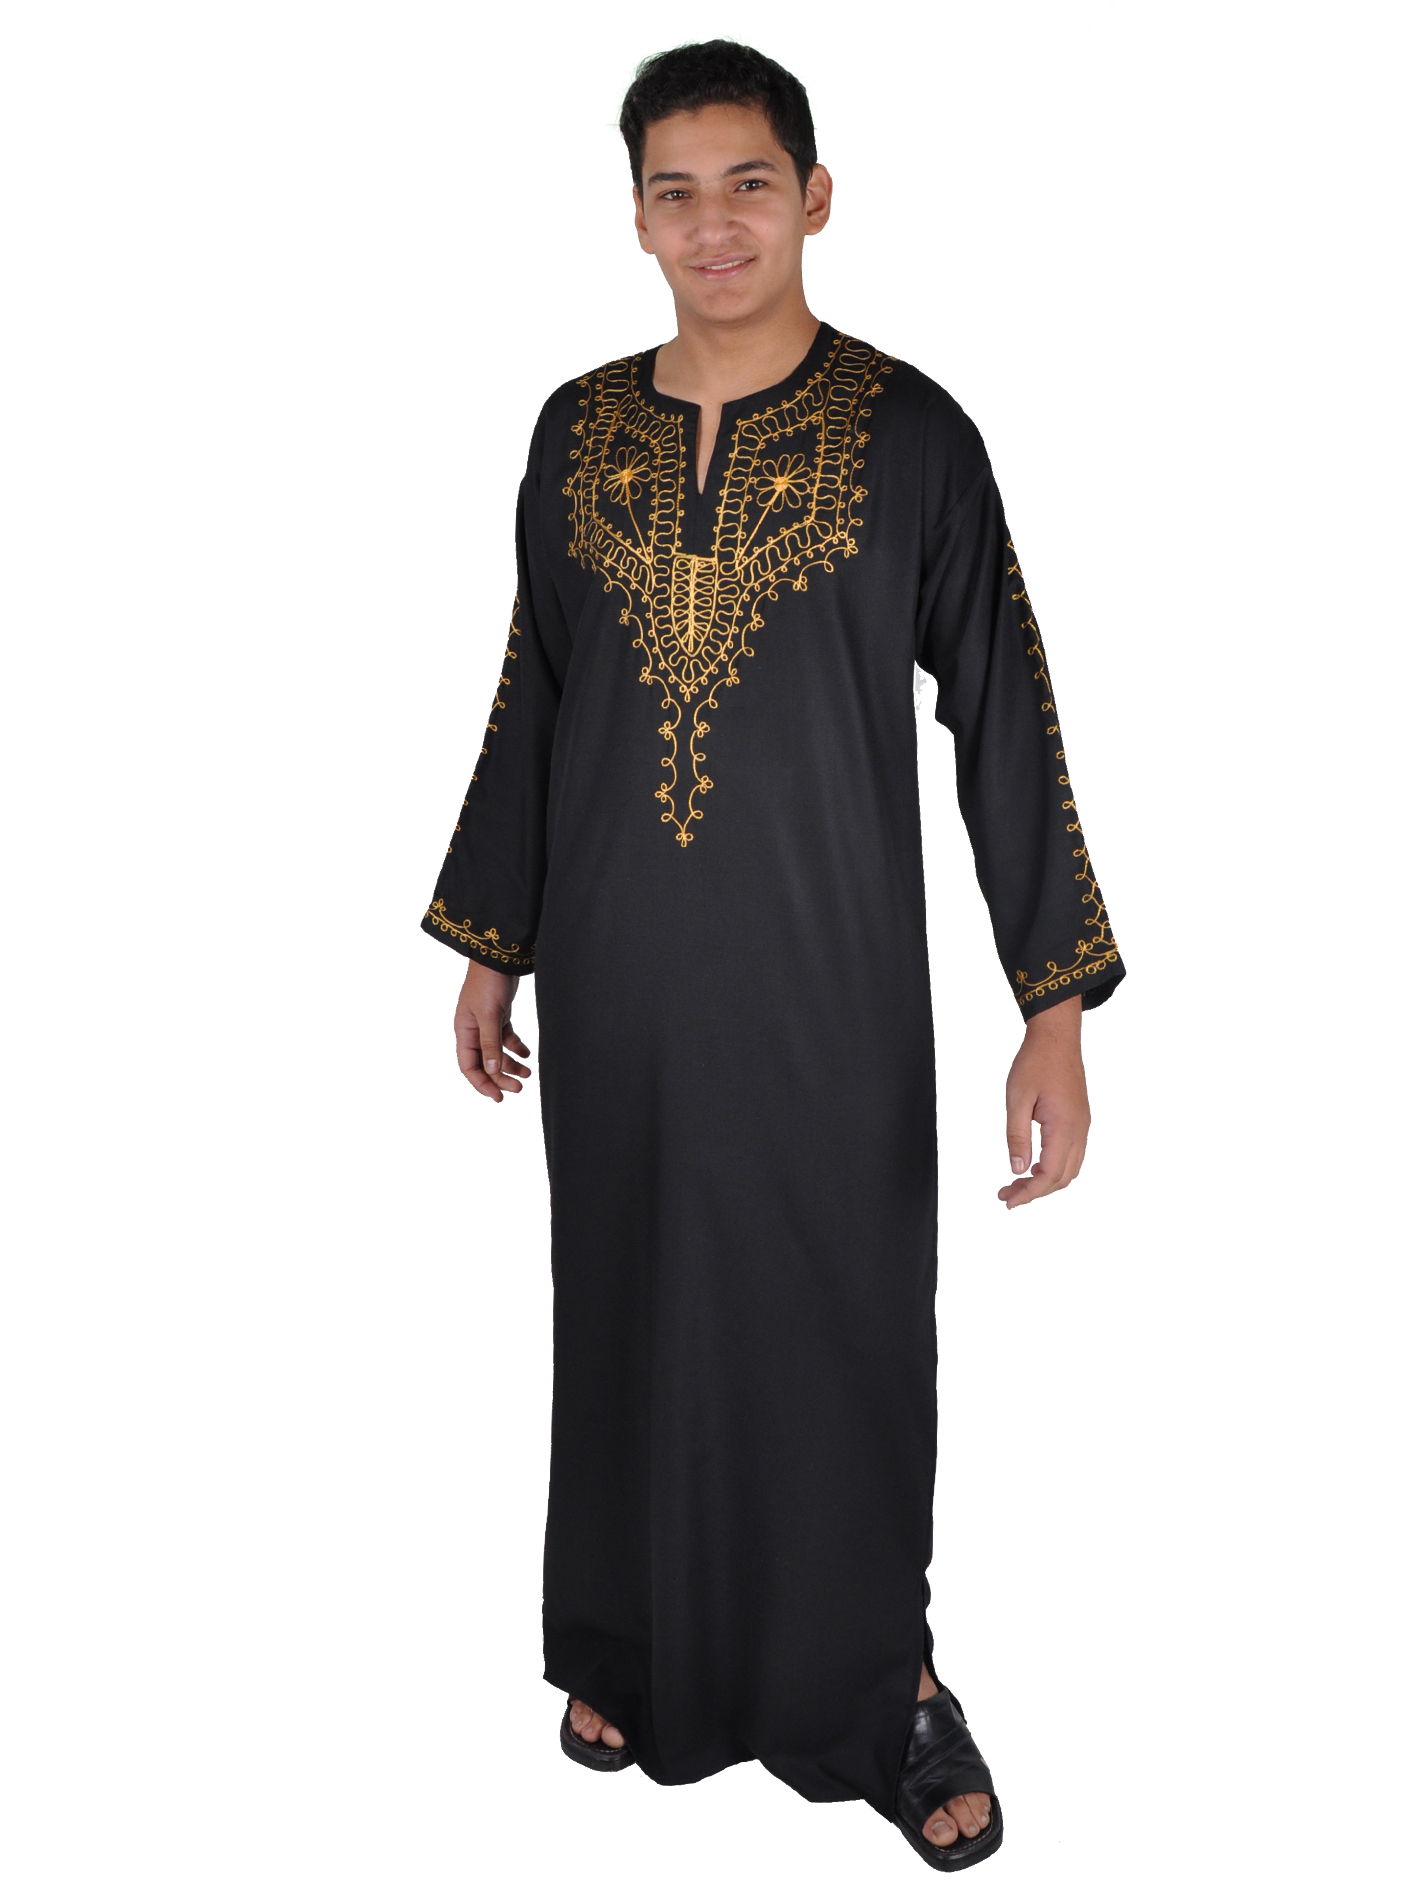 herren kaftan arabische herren kleider egypt bazar onlineshop. Black Bedroom Furniture Sets. Home Design Ideas